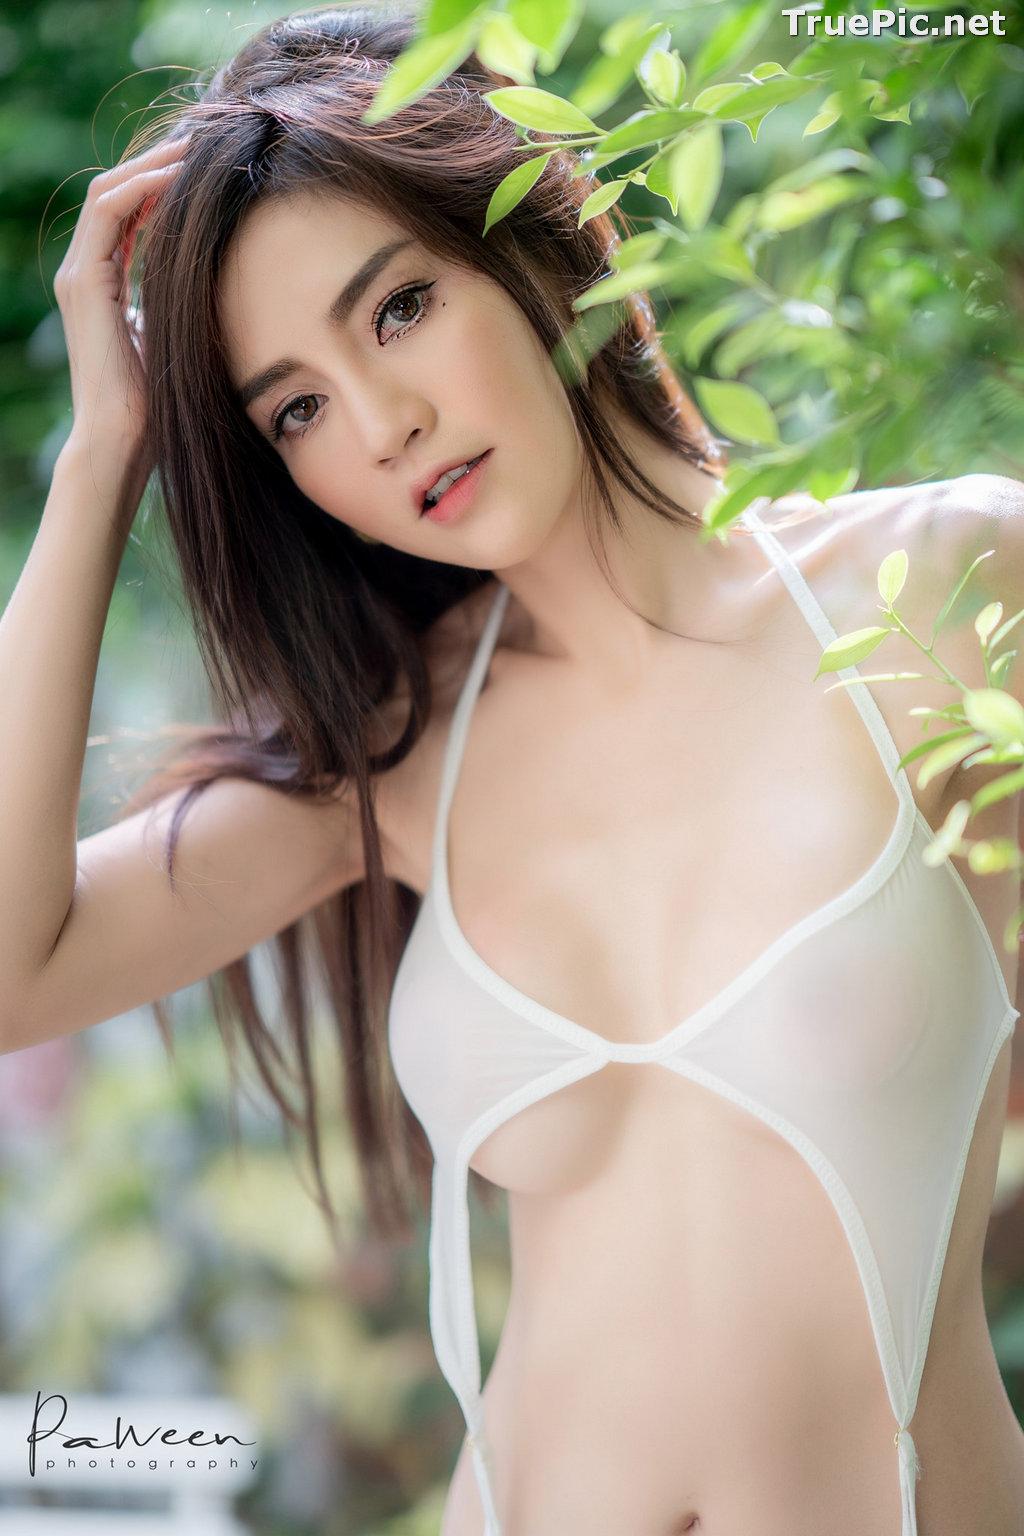 Image Thailand Model - Ladapa Ratchataamonchot - Sexy Garden - TruePic.net - Picture-2